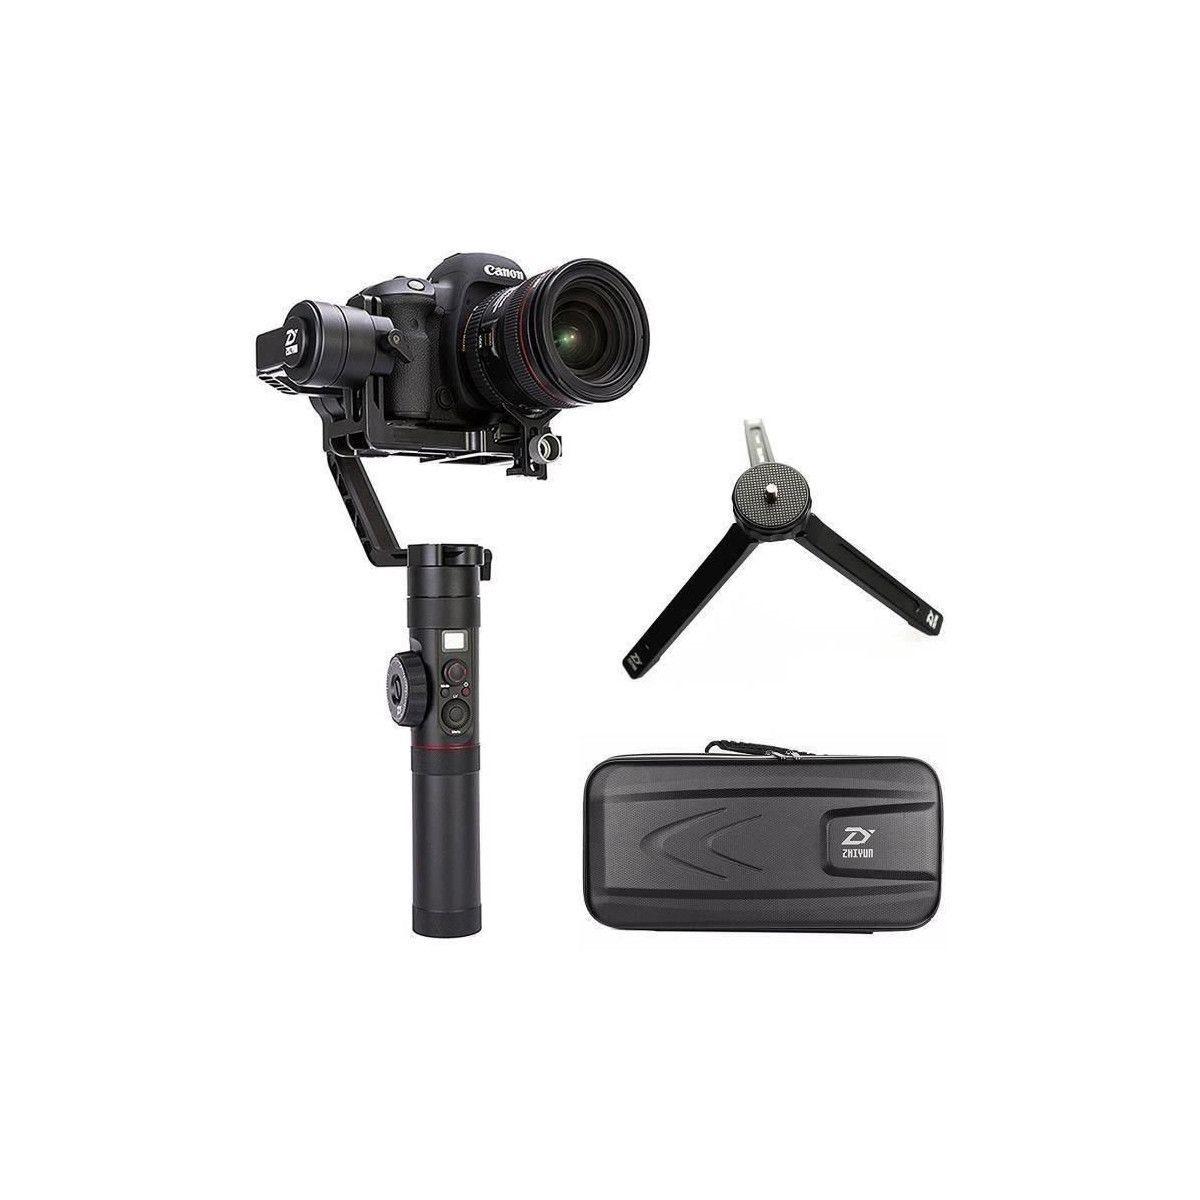 Acheter Canon Eos 4000d Appareil Photo Reflex Objectif Ef S 18 55